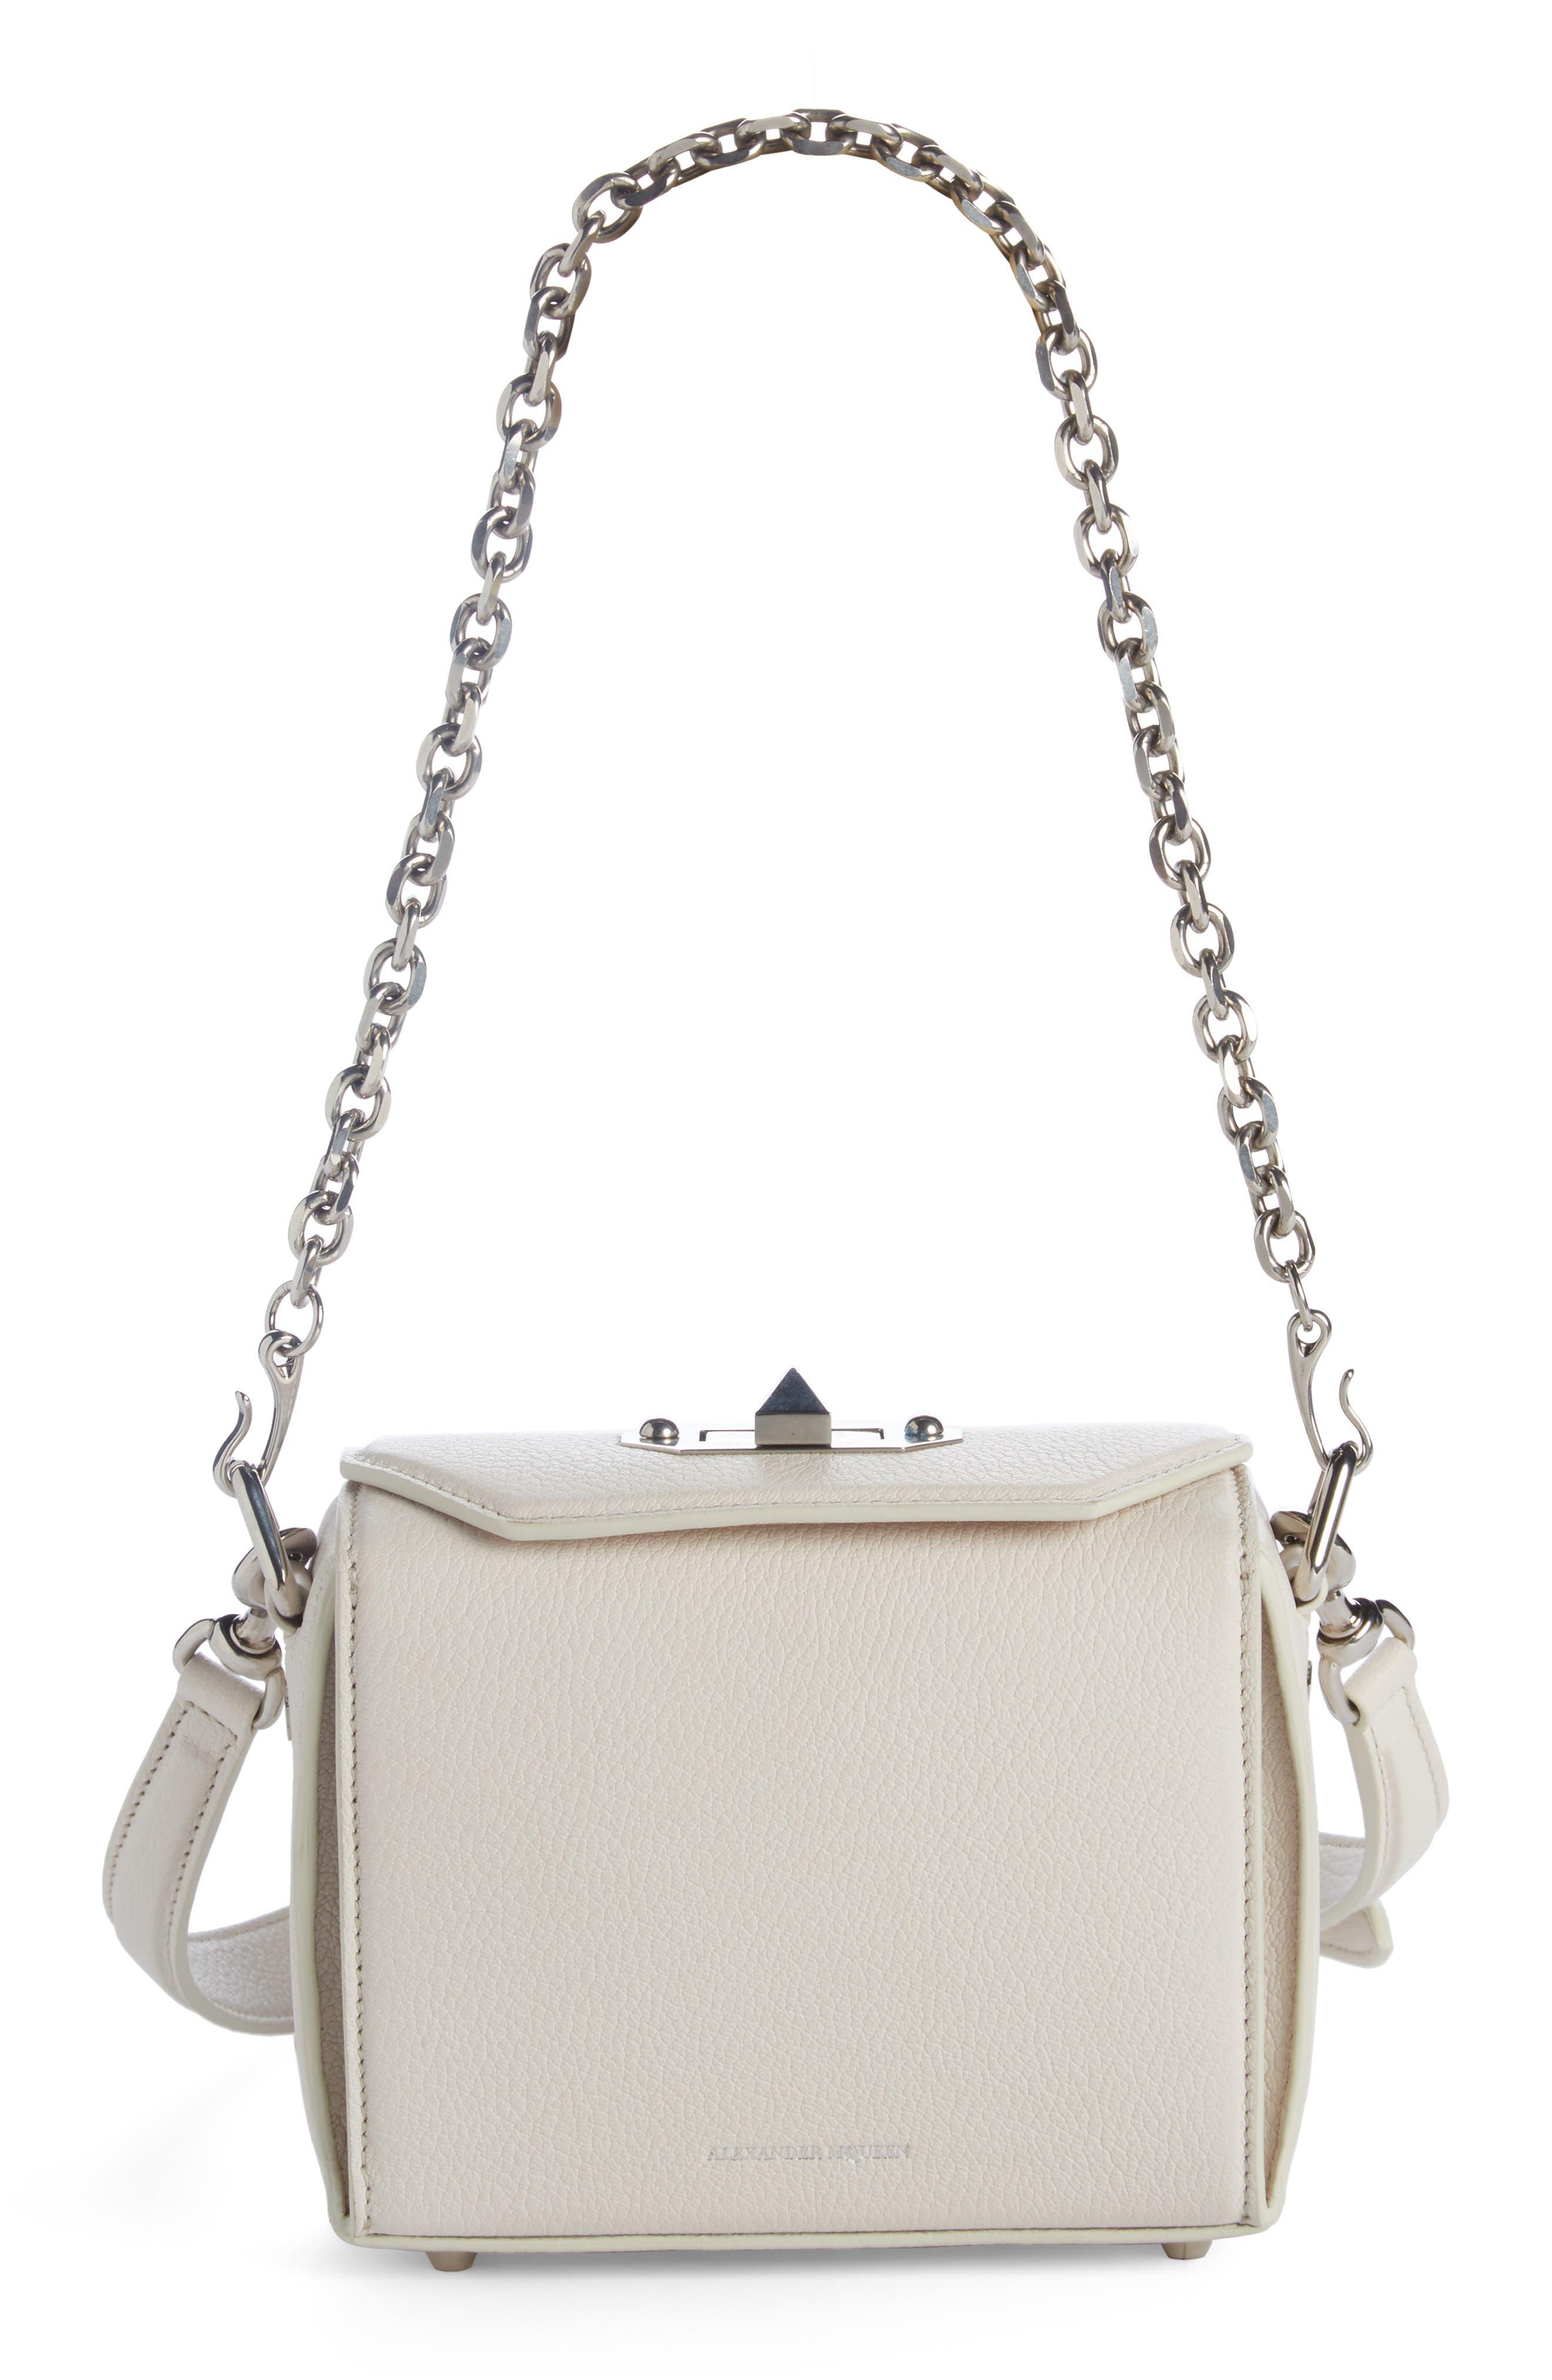 Box Bag 16 Grained Leather Bag,                             Alternate thumbnail 8, color,                             900